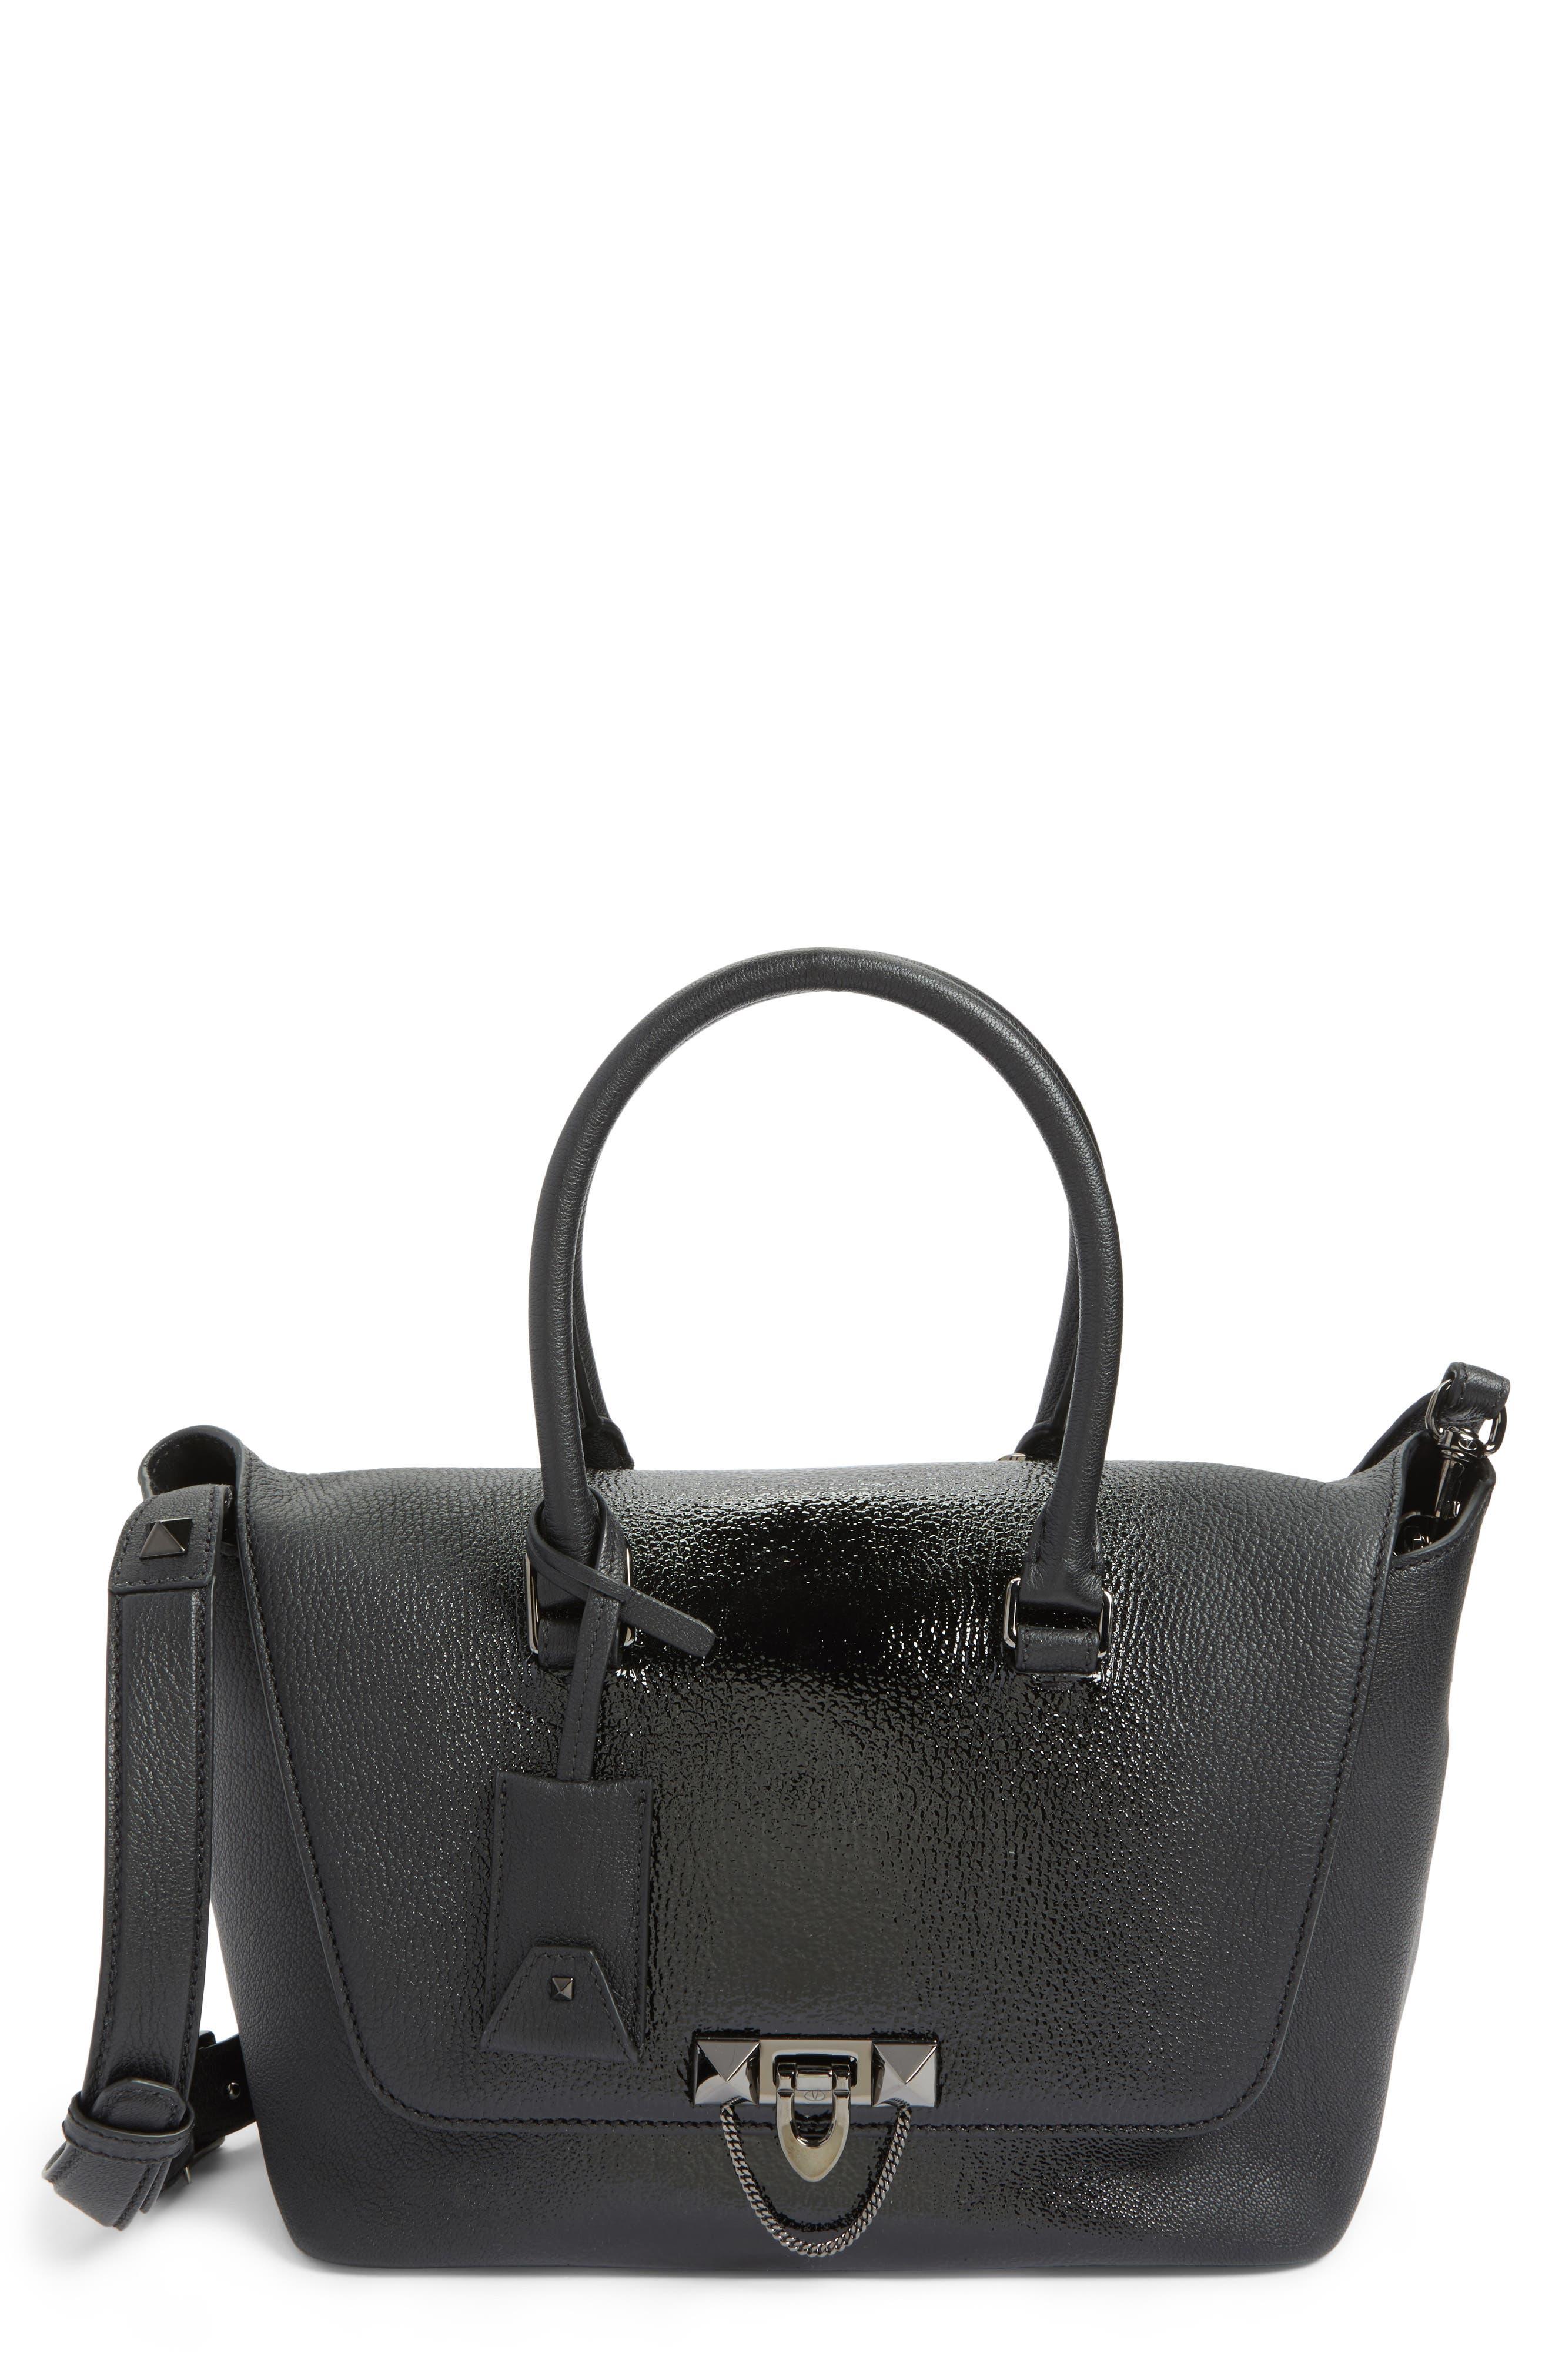 VALENTINO GARAVANI Demilune Top Handle Leather Satchel